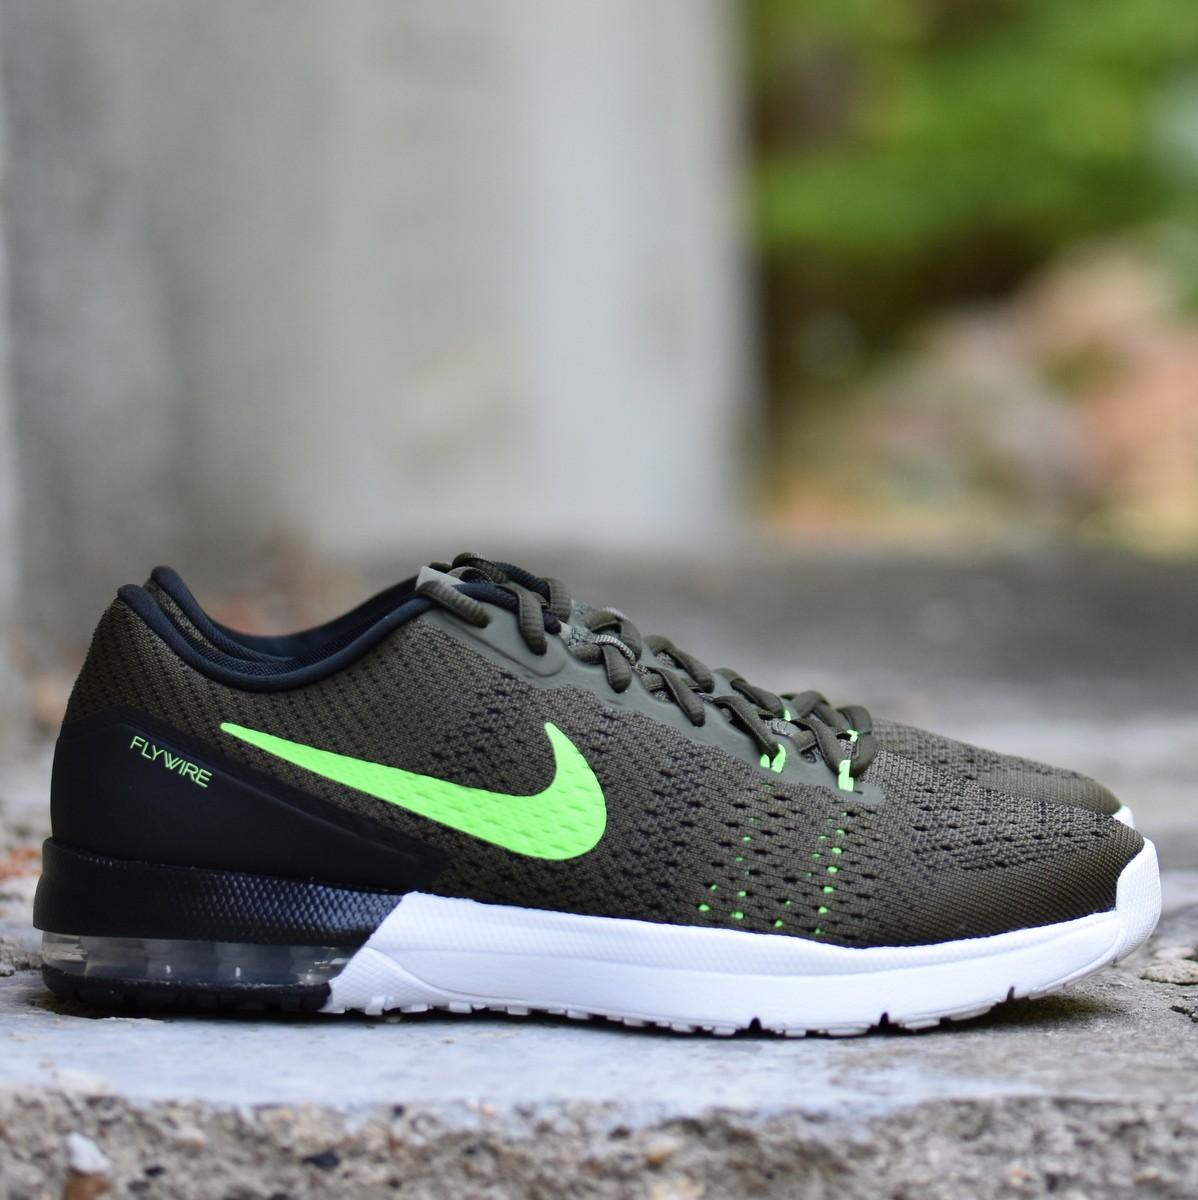 27e61c9772f Nike AIR MAX TYPHA Pánské boty EU 41 820198-330